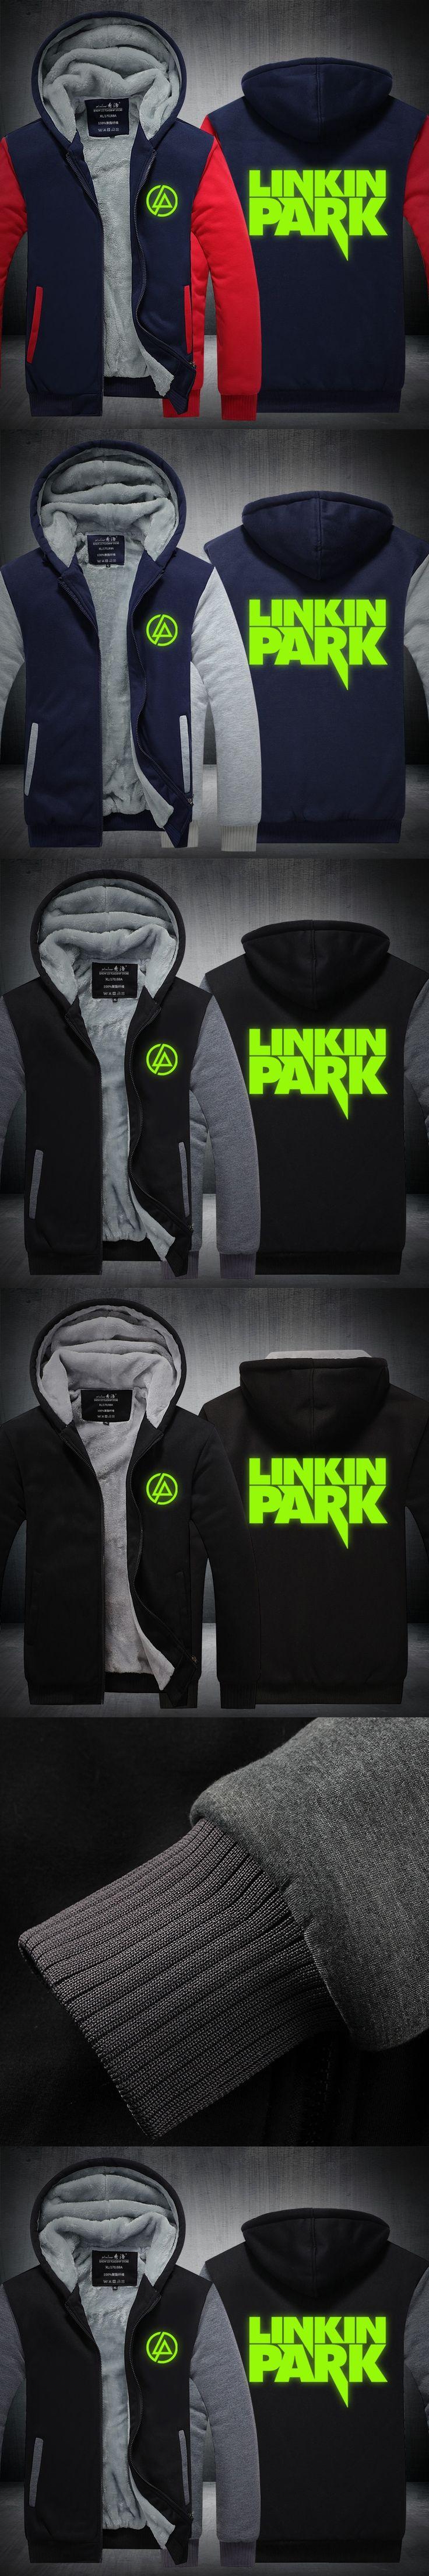 Autumn and Winter Linkin Park Luminous Rock Band Zipper Male Cardigan Hoodies Cashmere Sweatshirts Thicken Coat Leisure Jacket